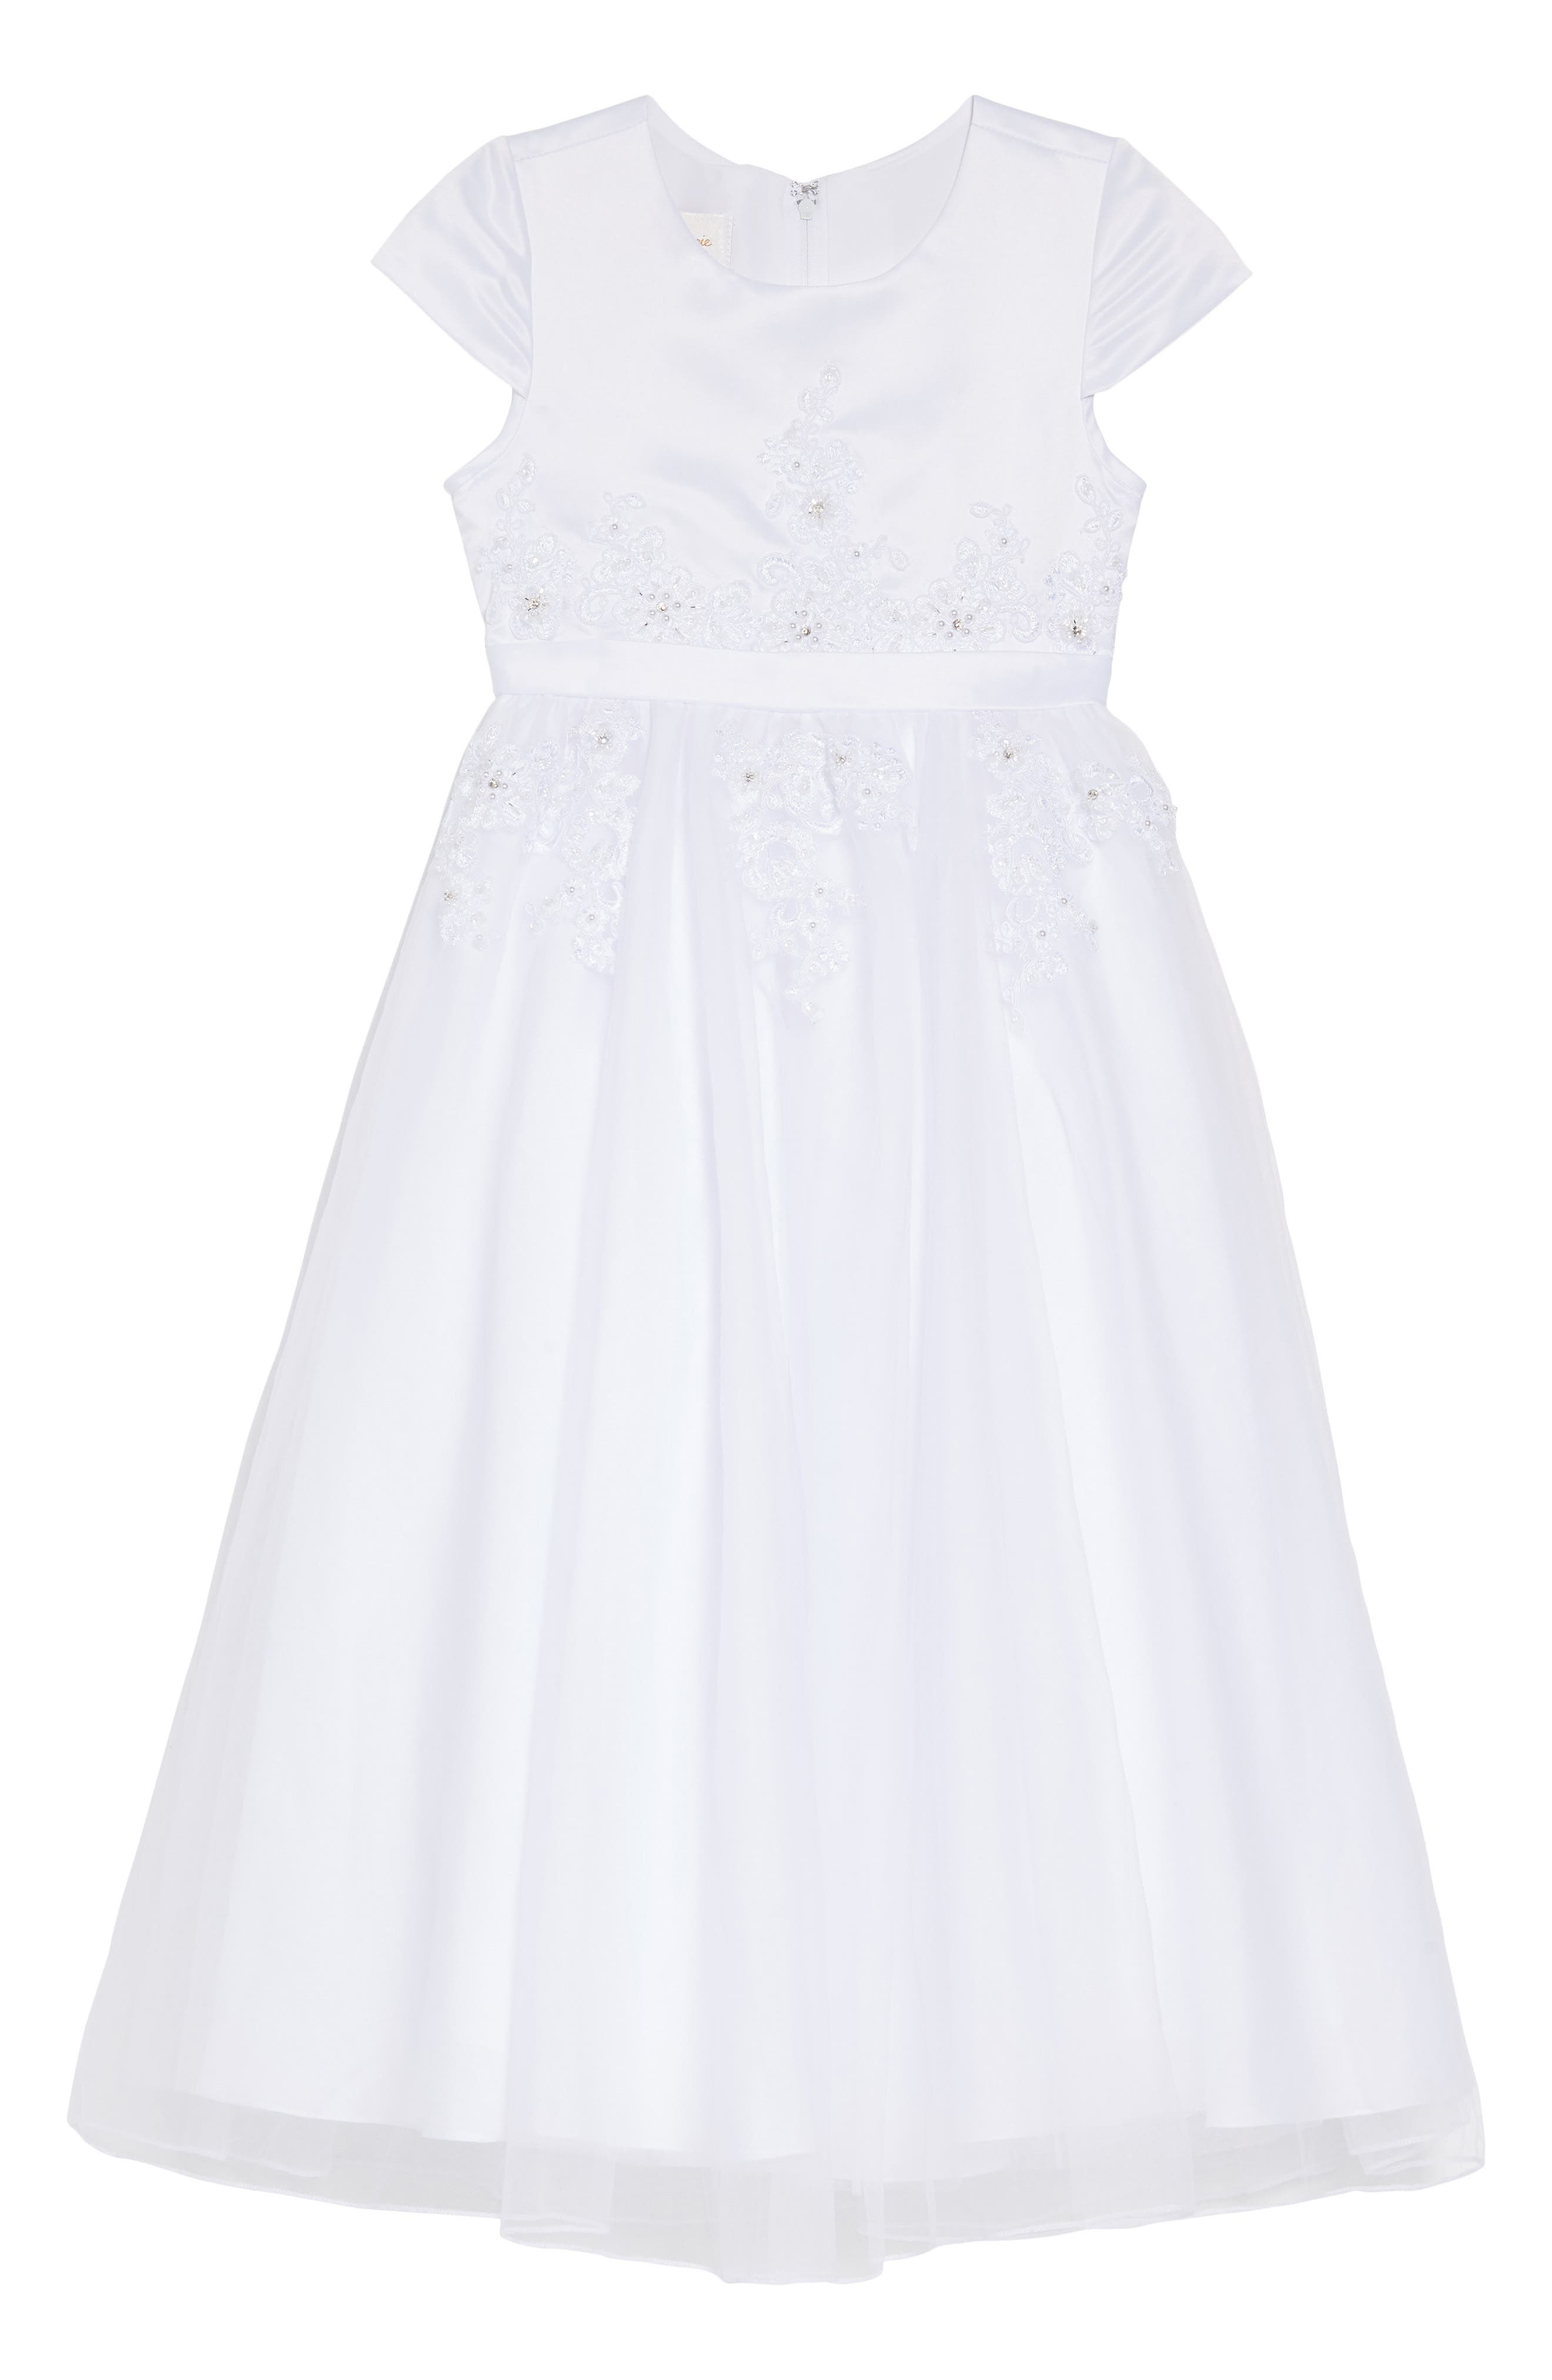 LAUREN MARIE,                             Beaded Lace First Communion Dress,                             Main thumbnail 1, color,                             WHITE